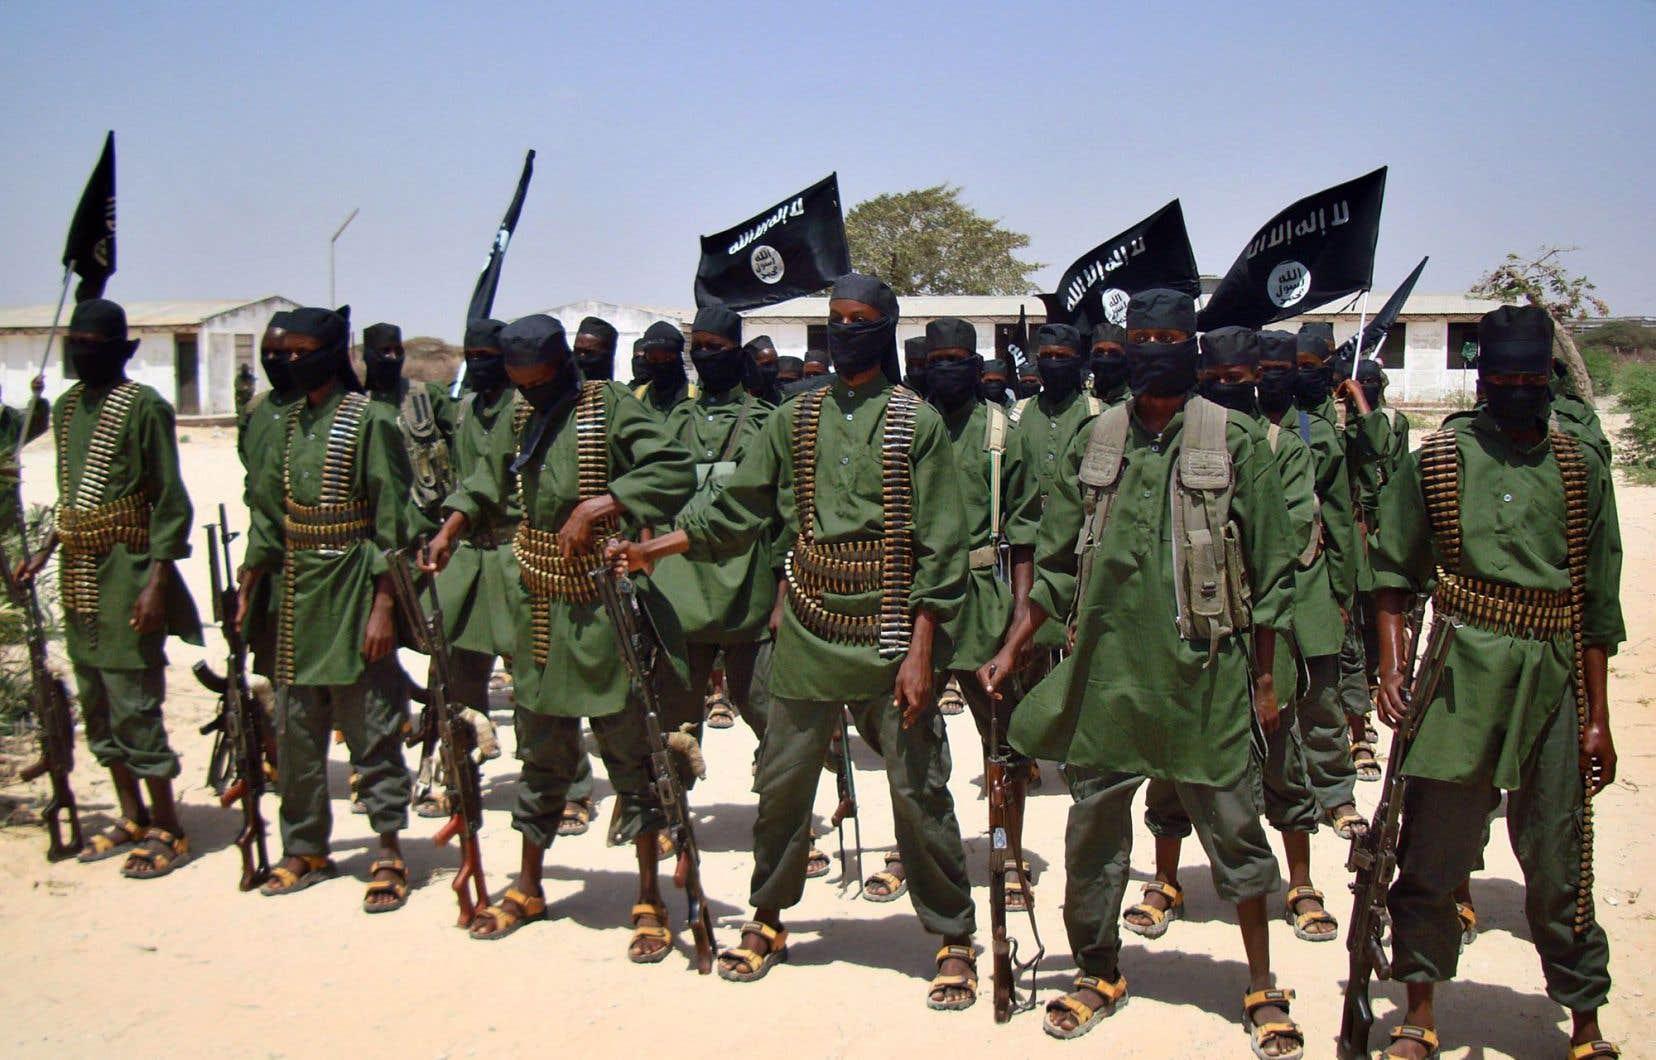 Des combattants d'al-Qaïda au Yémen lors d'un entraînement. AQPA a revendiqué l'attentat contre Charlie Hebdo.